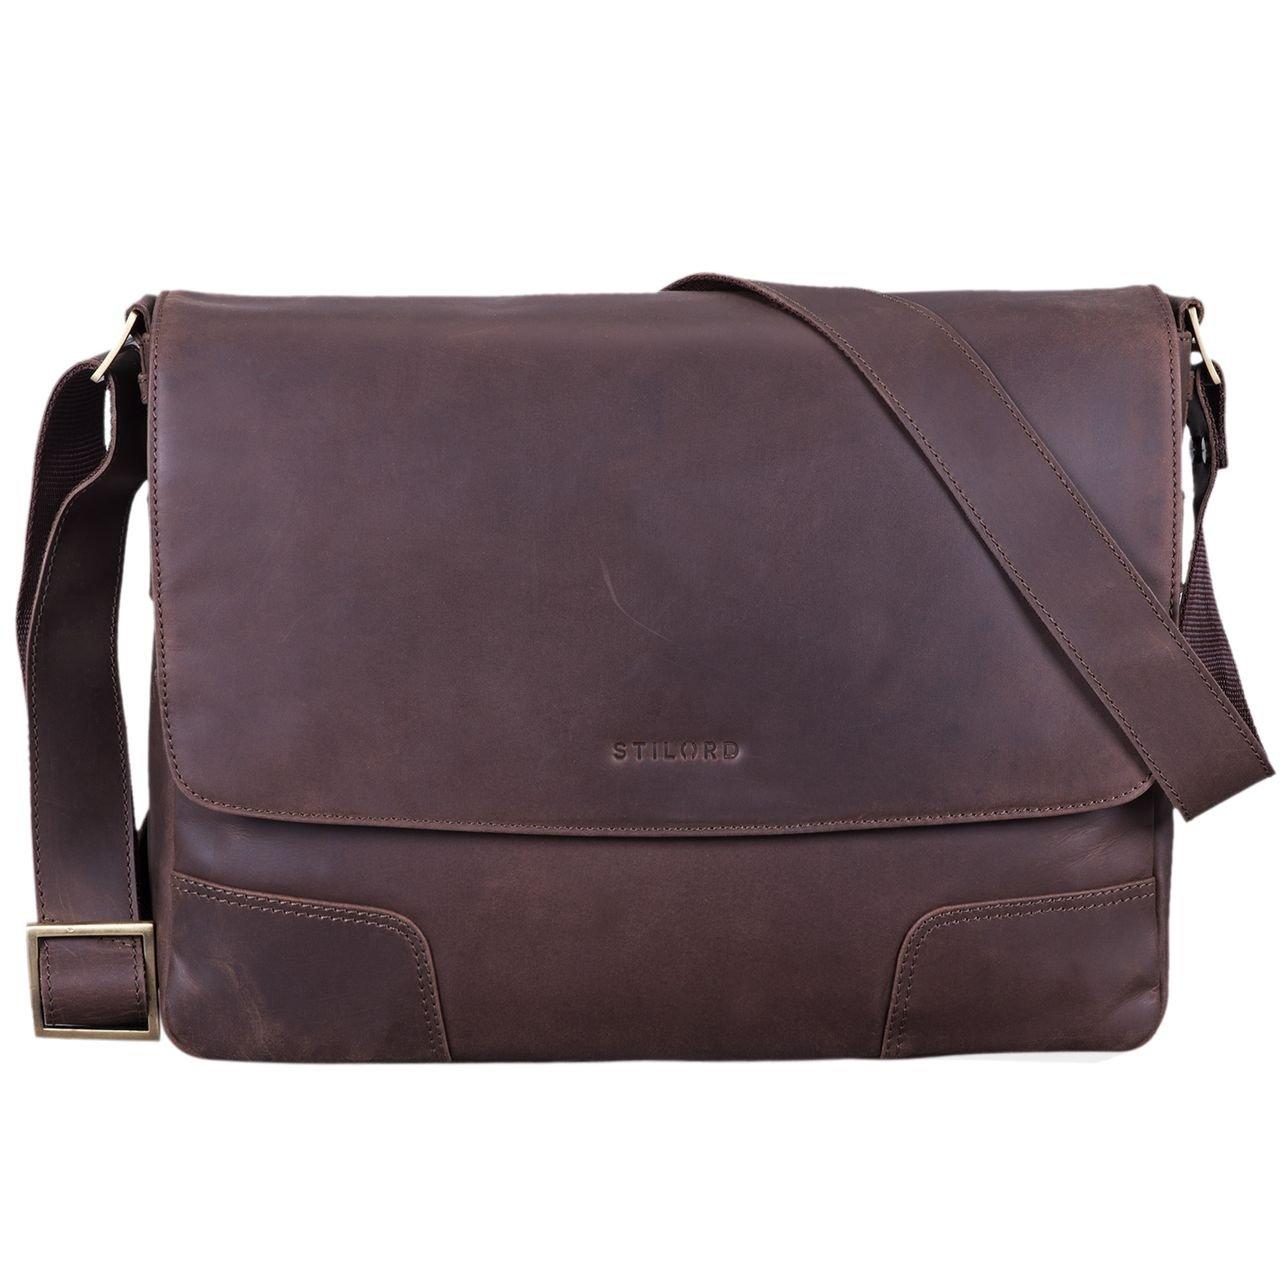 STILORD 'Miro' Messenger Bag Leder Umhä ngetasche 14 Zoll Vintage Design fü r Herren Damen Uni Bü ro Arbeit Aktentasche DIN A4 Laptoptasche Echtleder, Farbe:Cordoba - braun